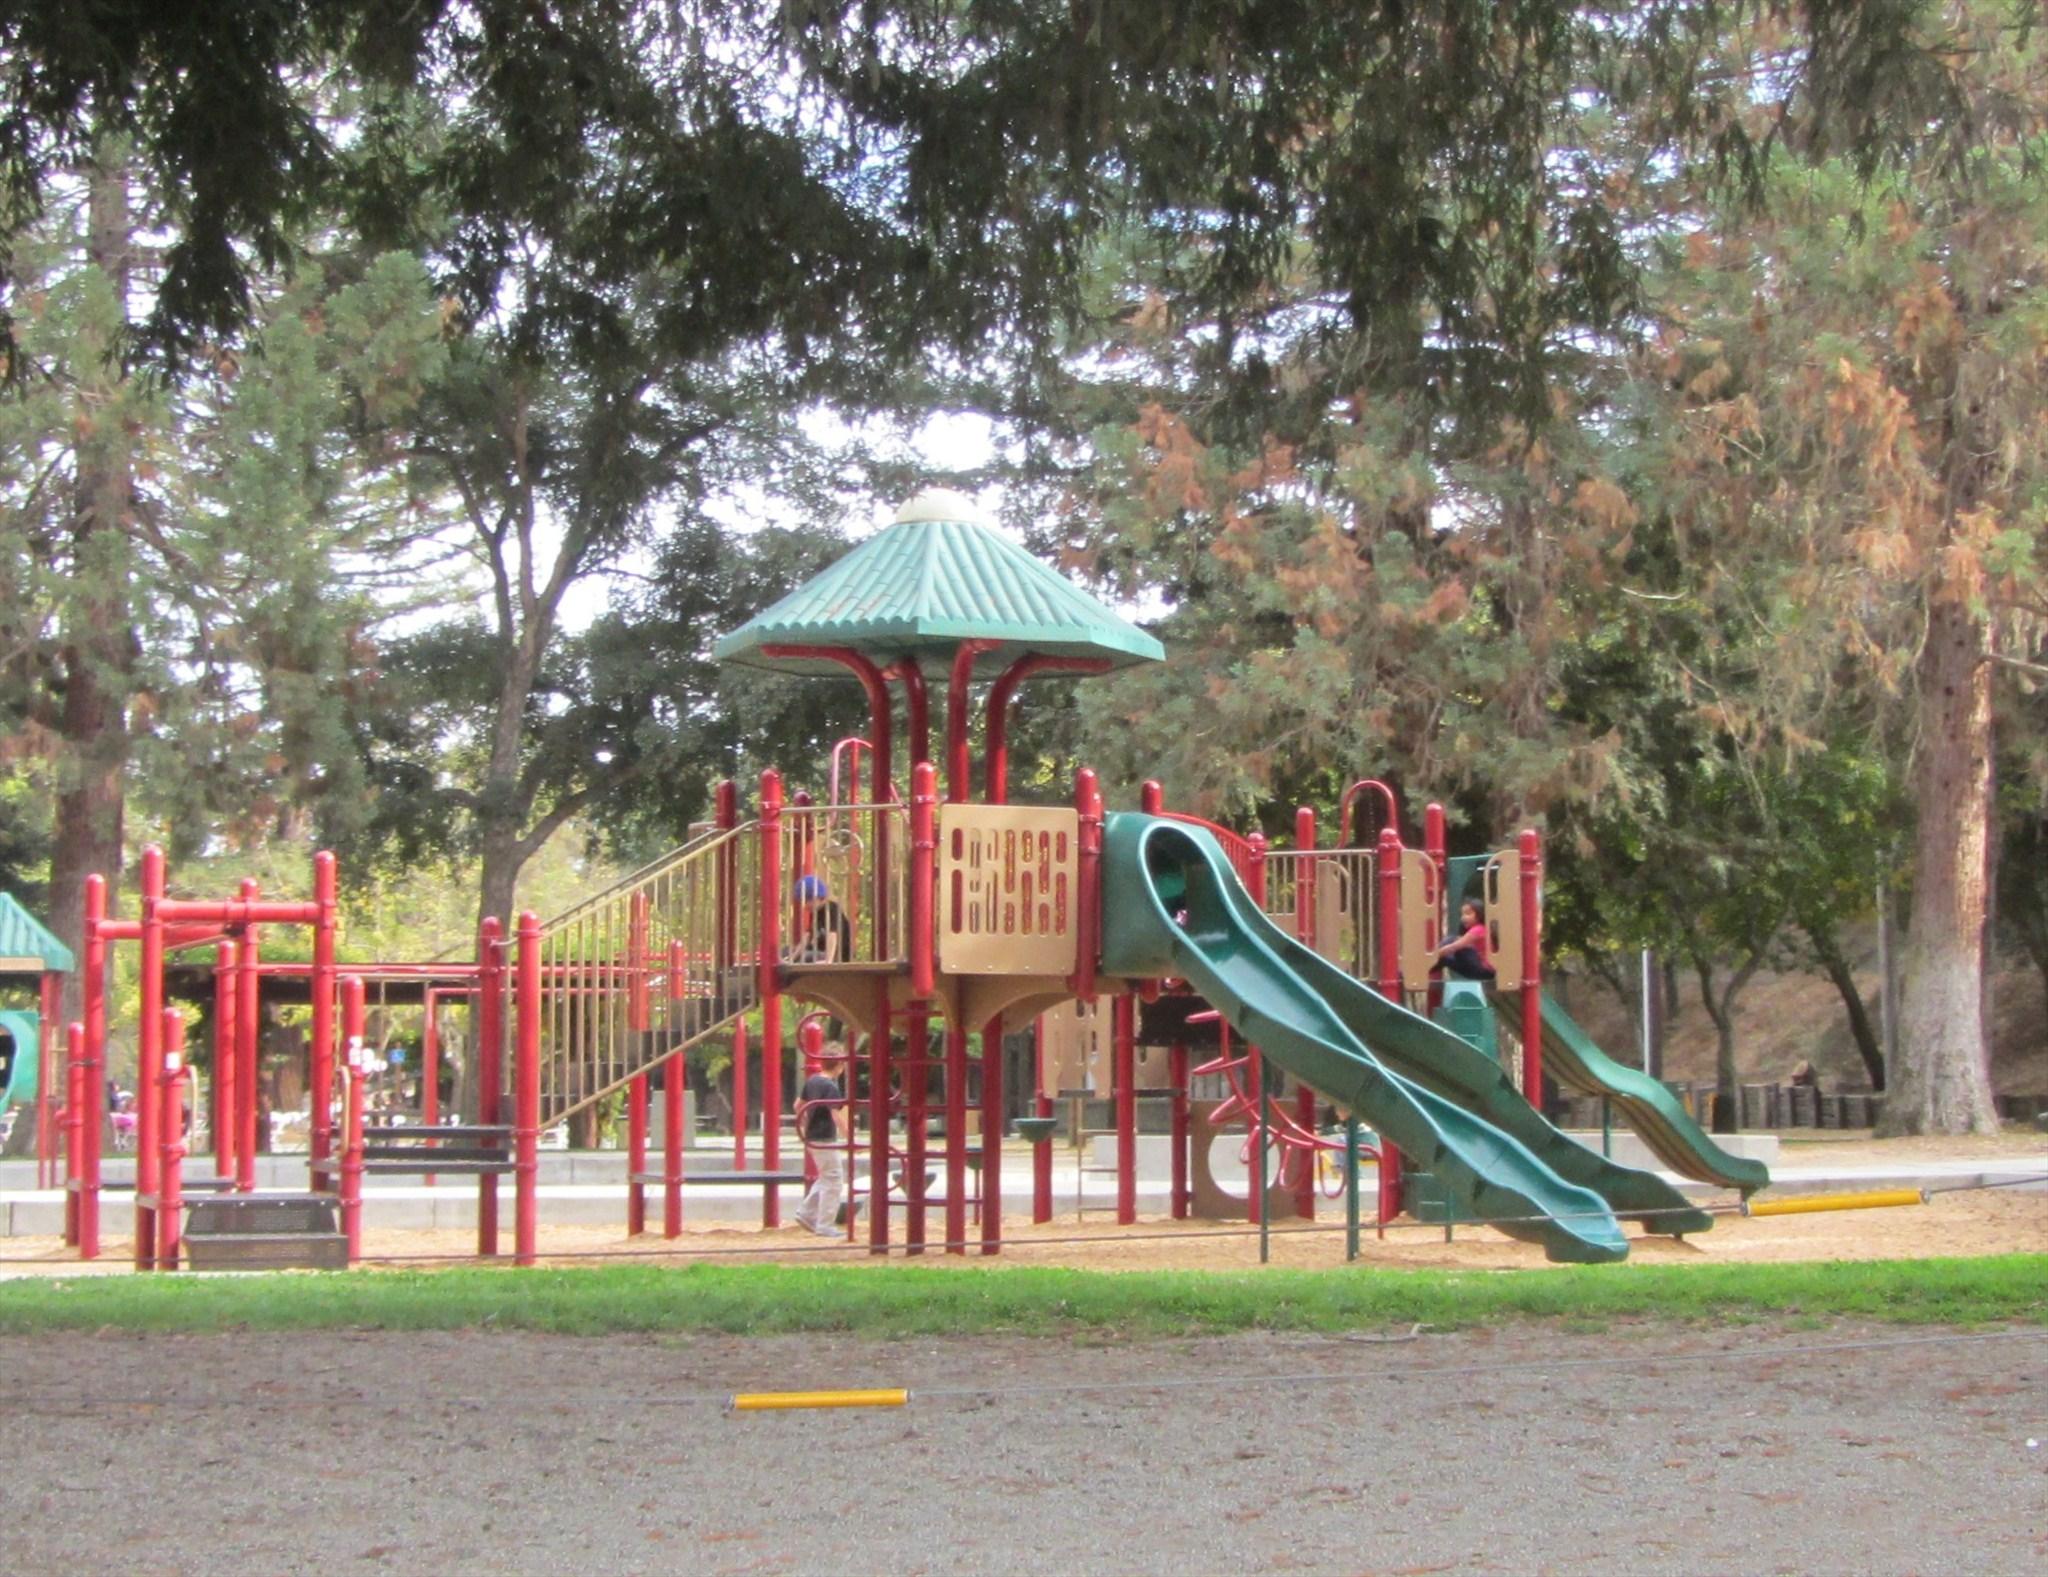 Christmas Hill Park Gilroy Ca 95020.Christmas Hill Park Playground Gilroy Ca Image